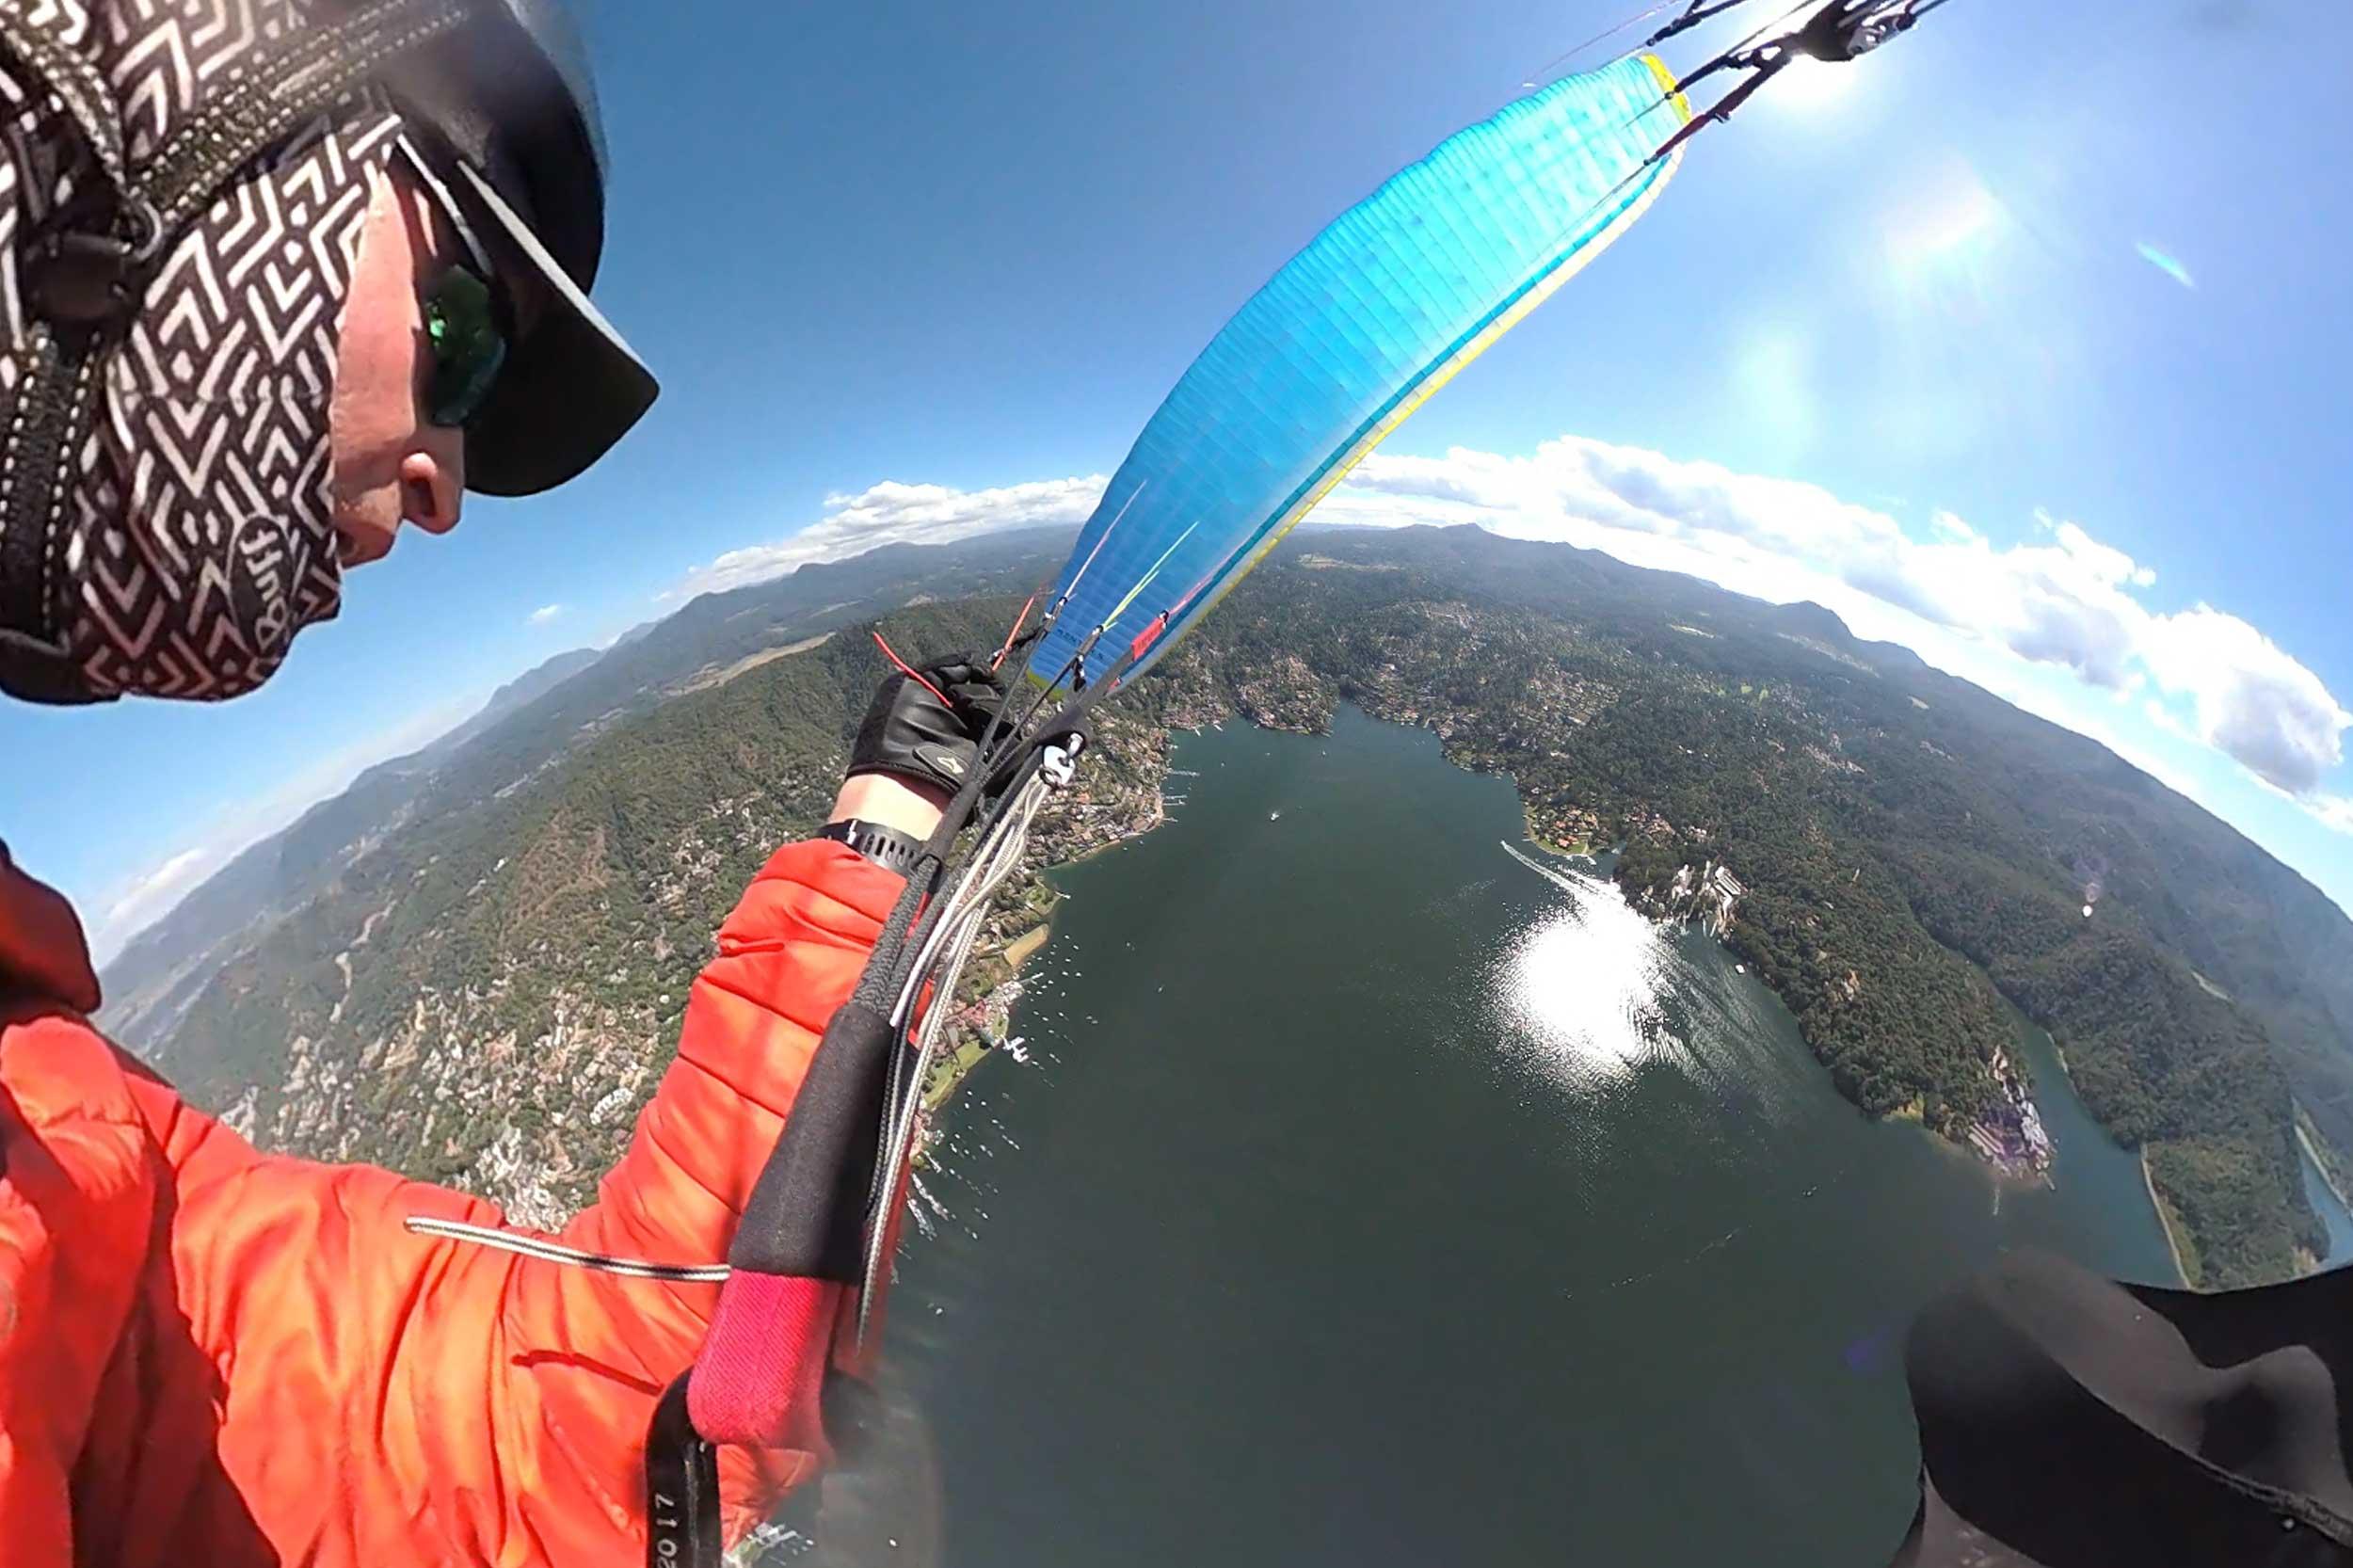 Paraglide-New-England-Trips-Valle-de-Bravo-Mexico-Gallery-Ryan-Spiral.jpg